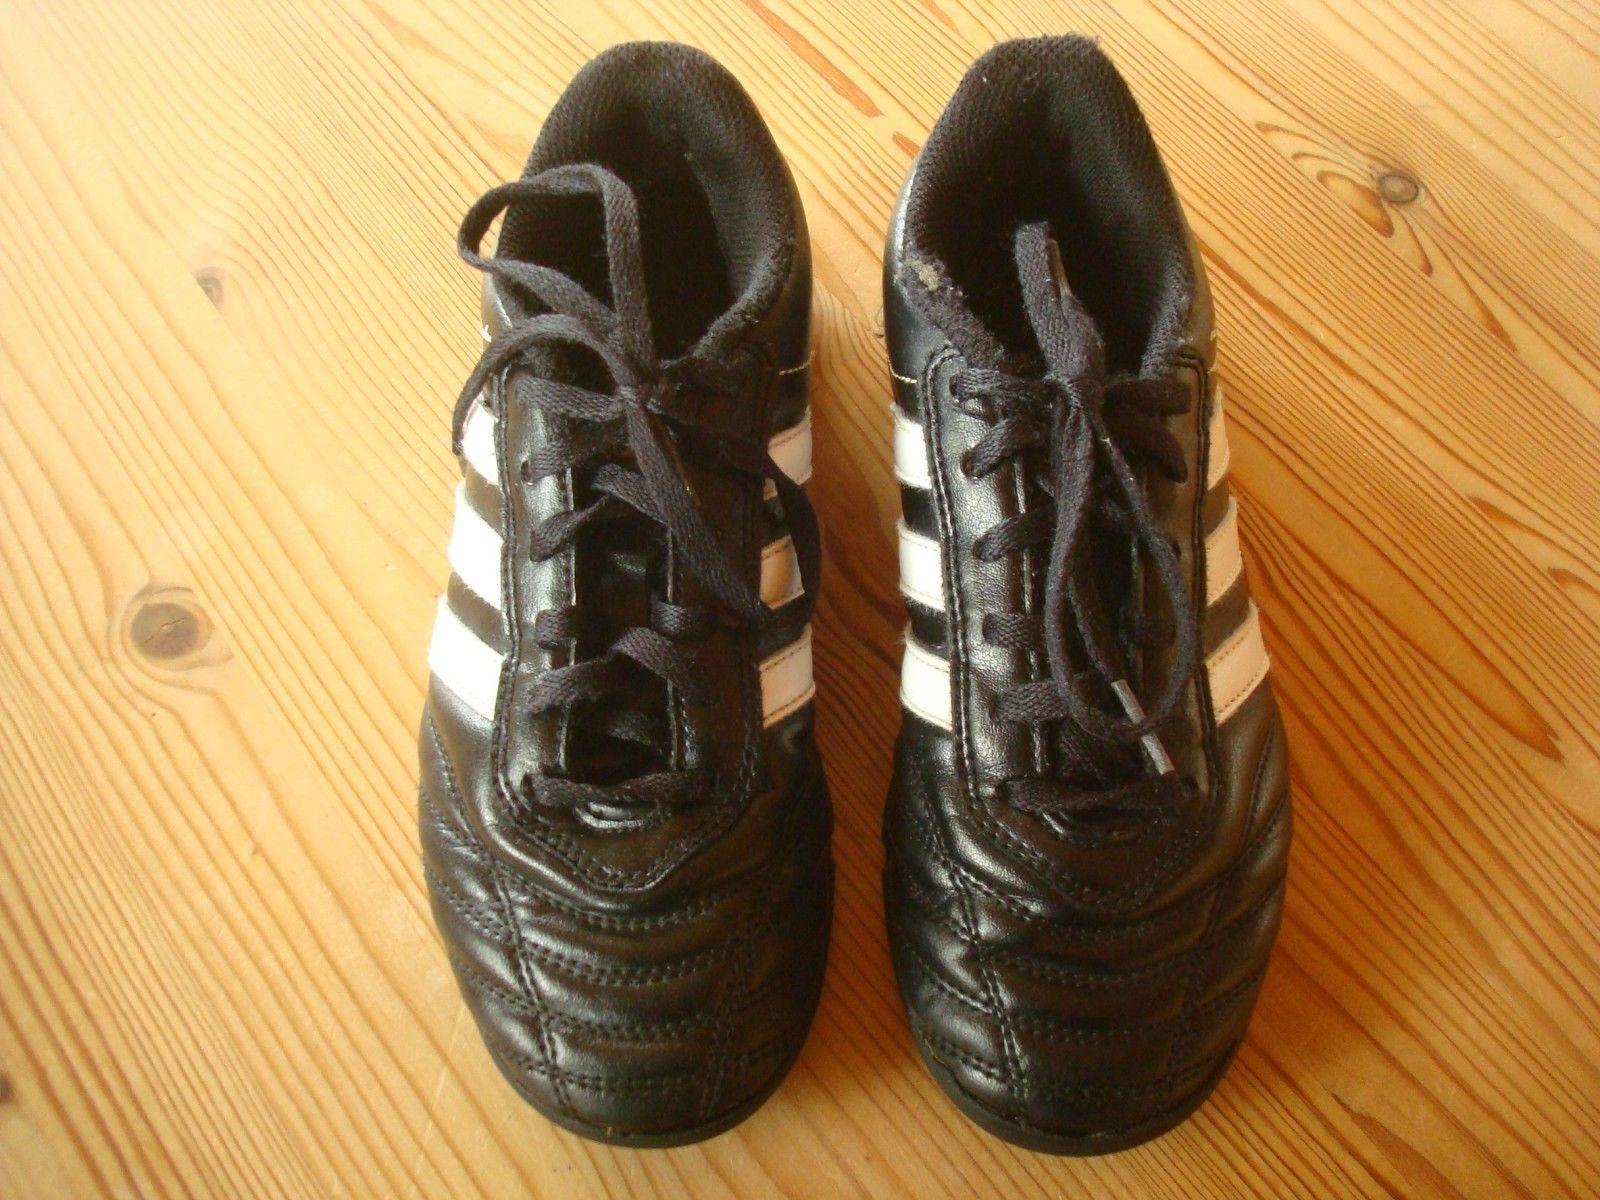 Adi Nocken Fussball Gr33 Schwarz Questra Adidas Schuhe